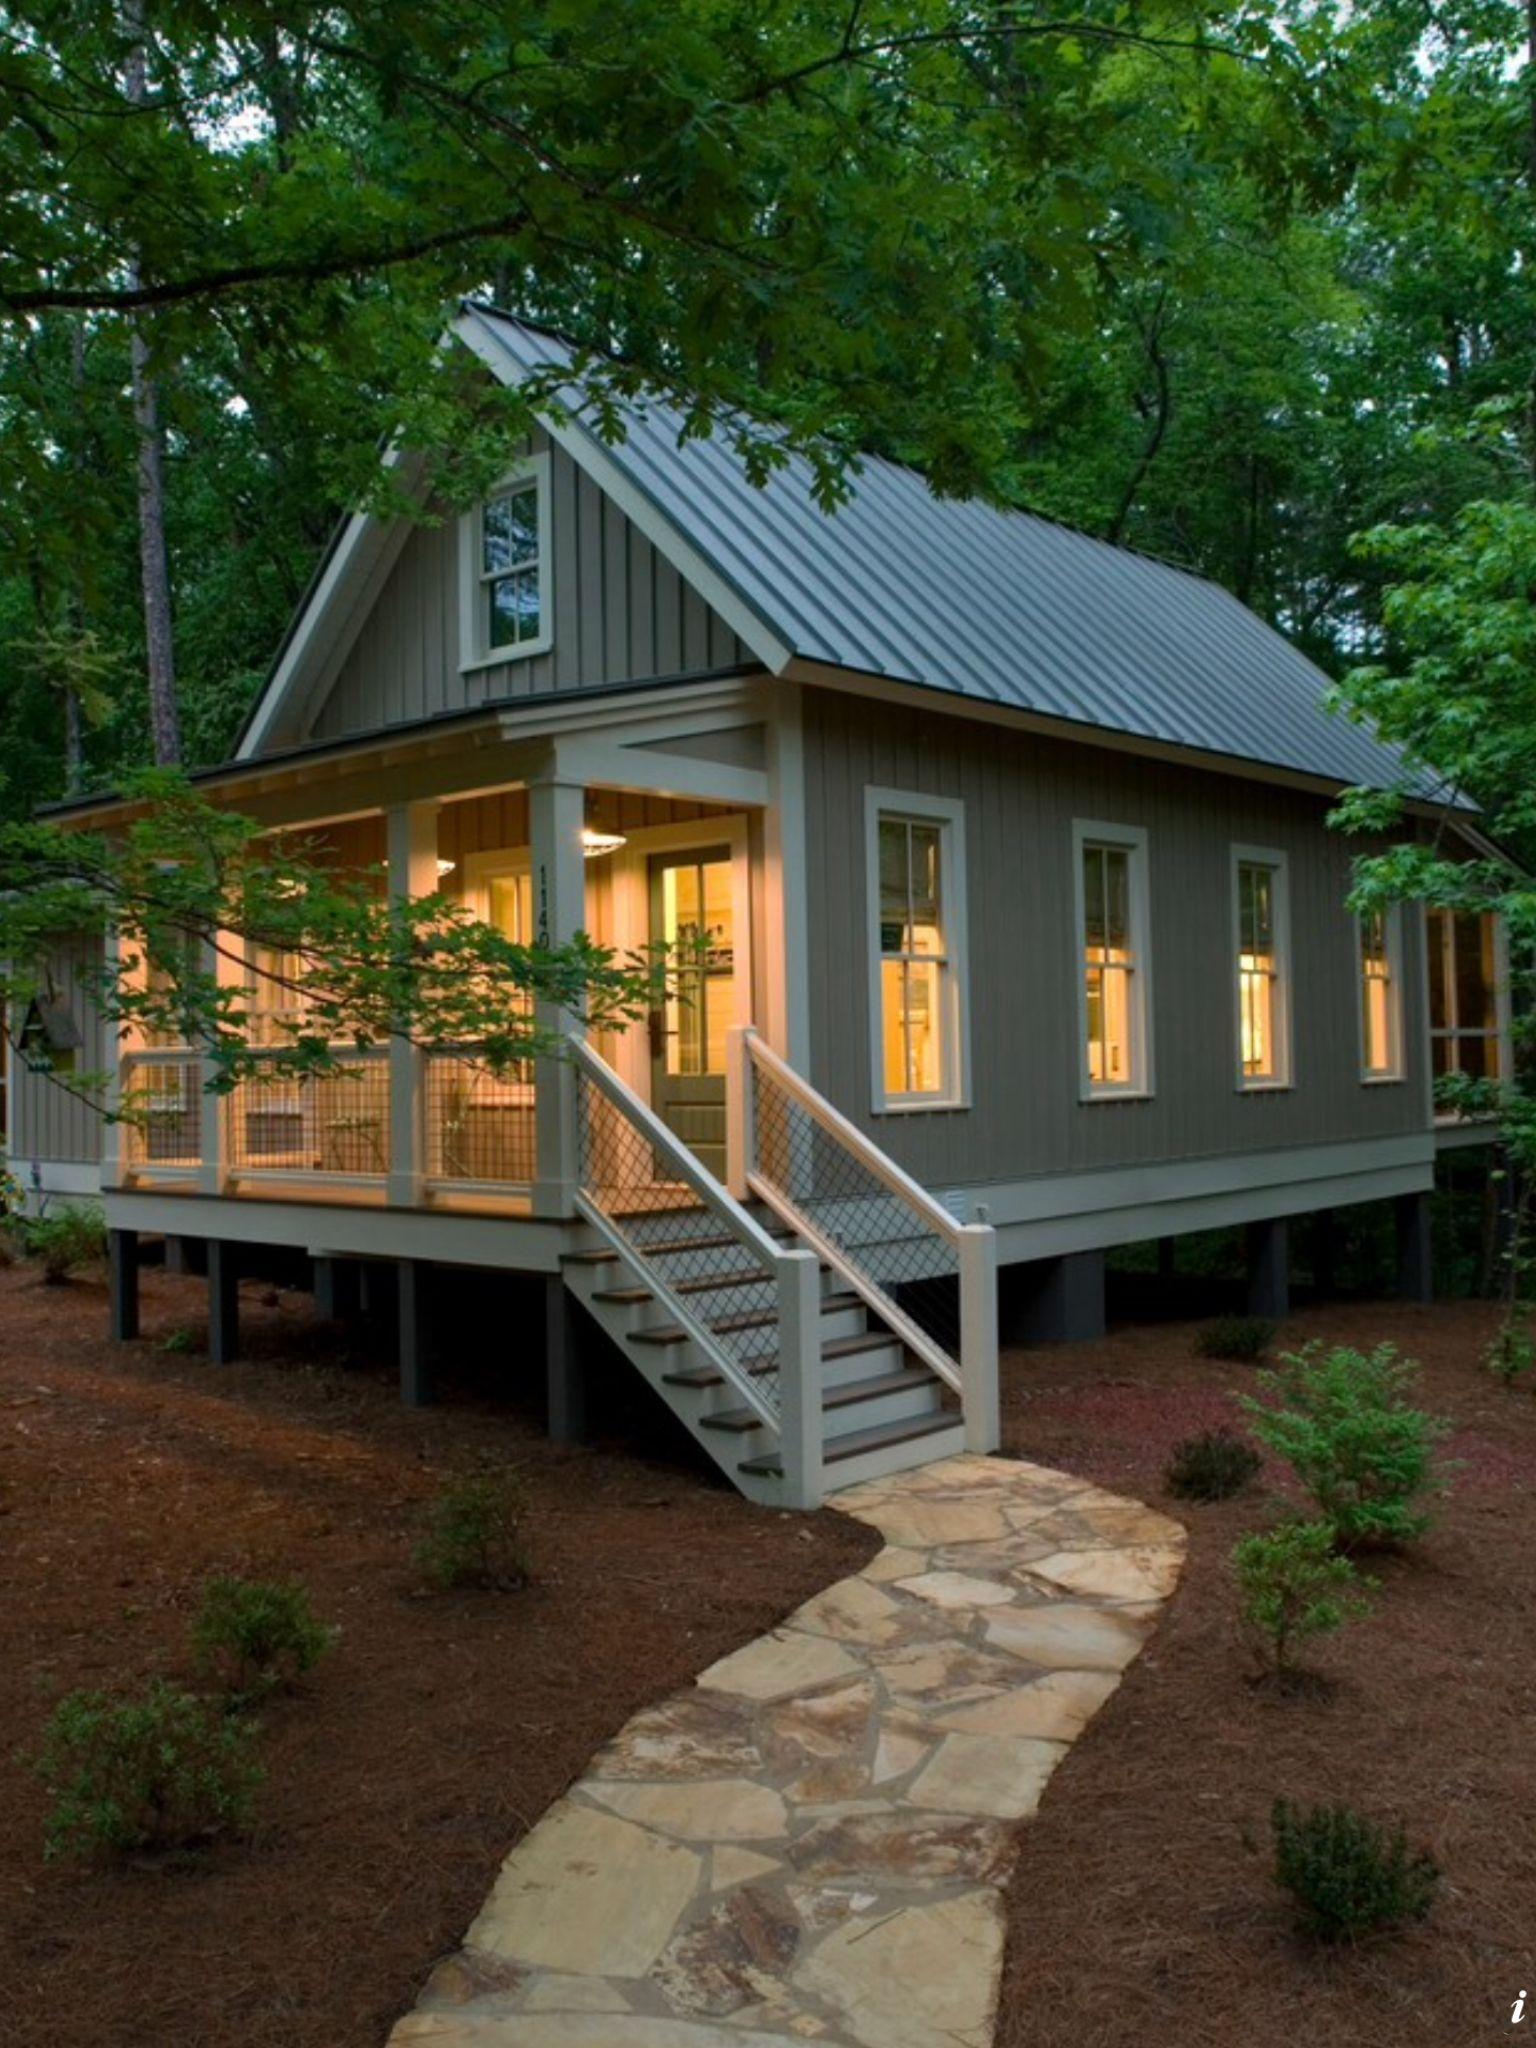 Cottages, Simple